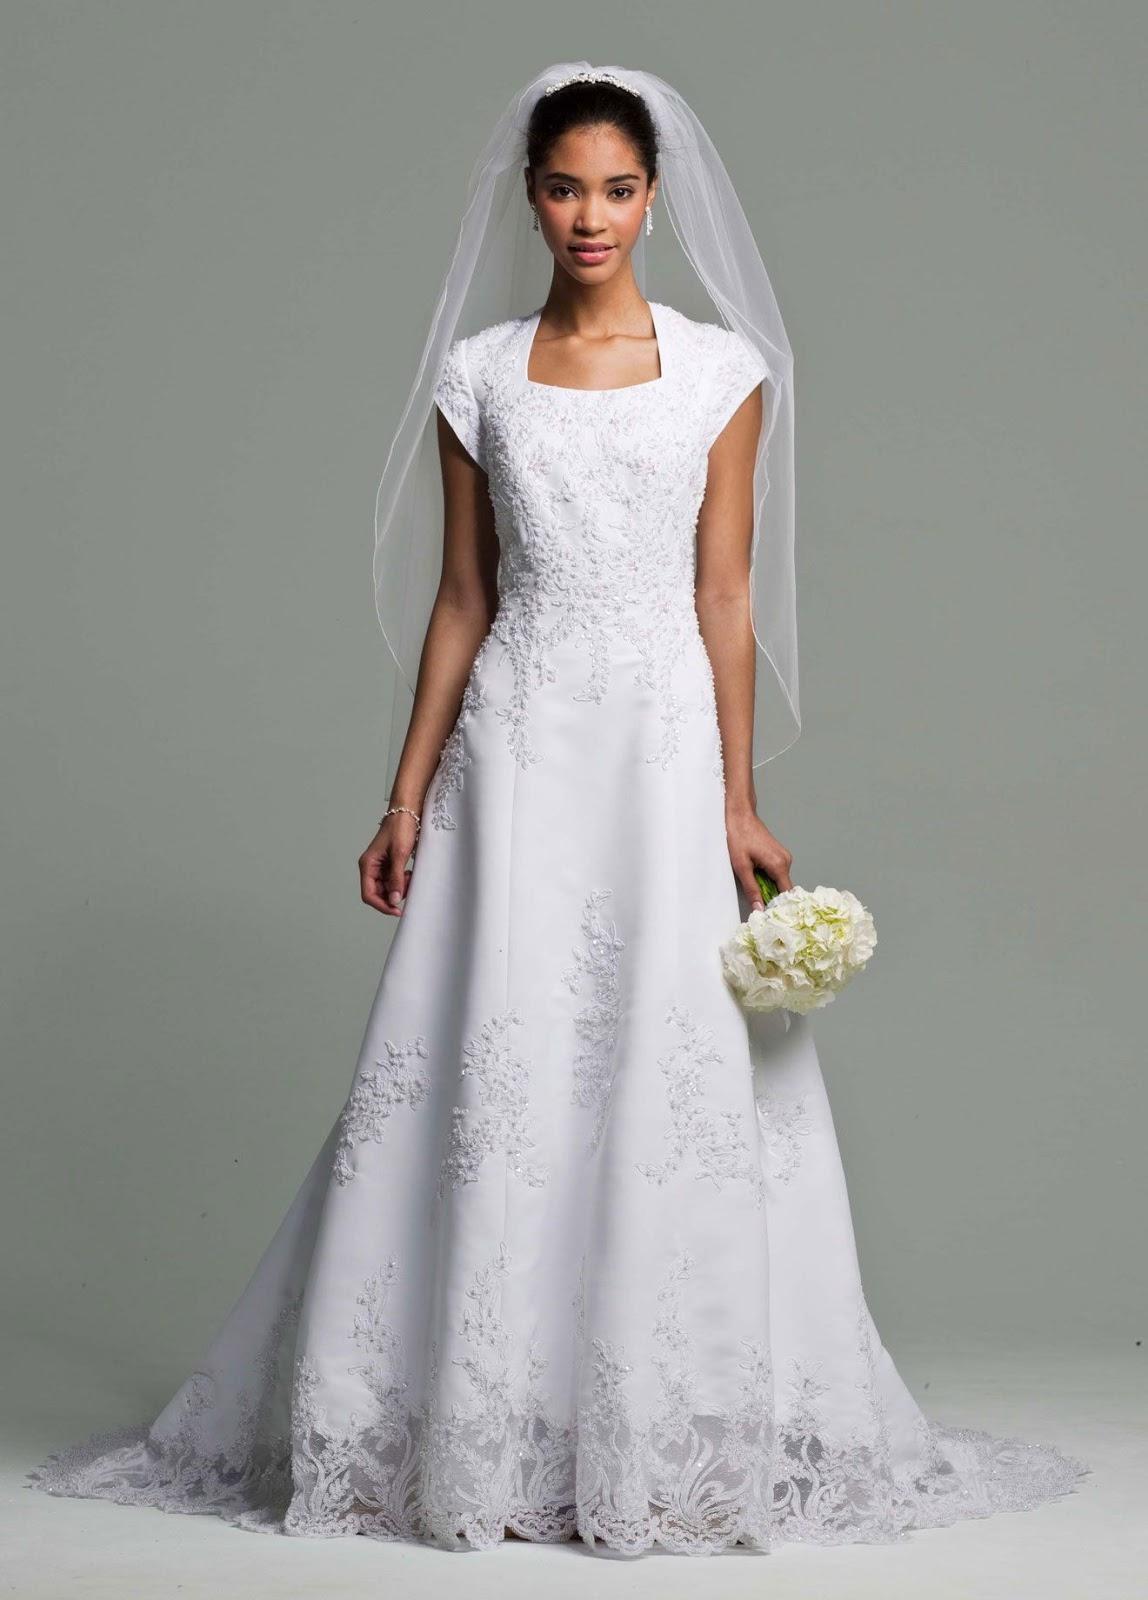 nyc wedding dresses photo - 1